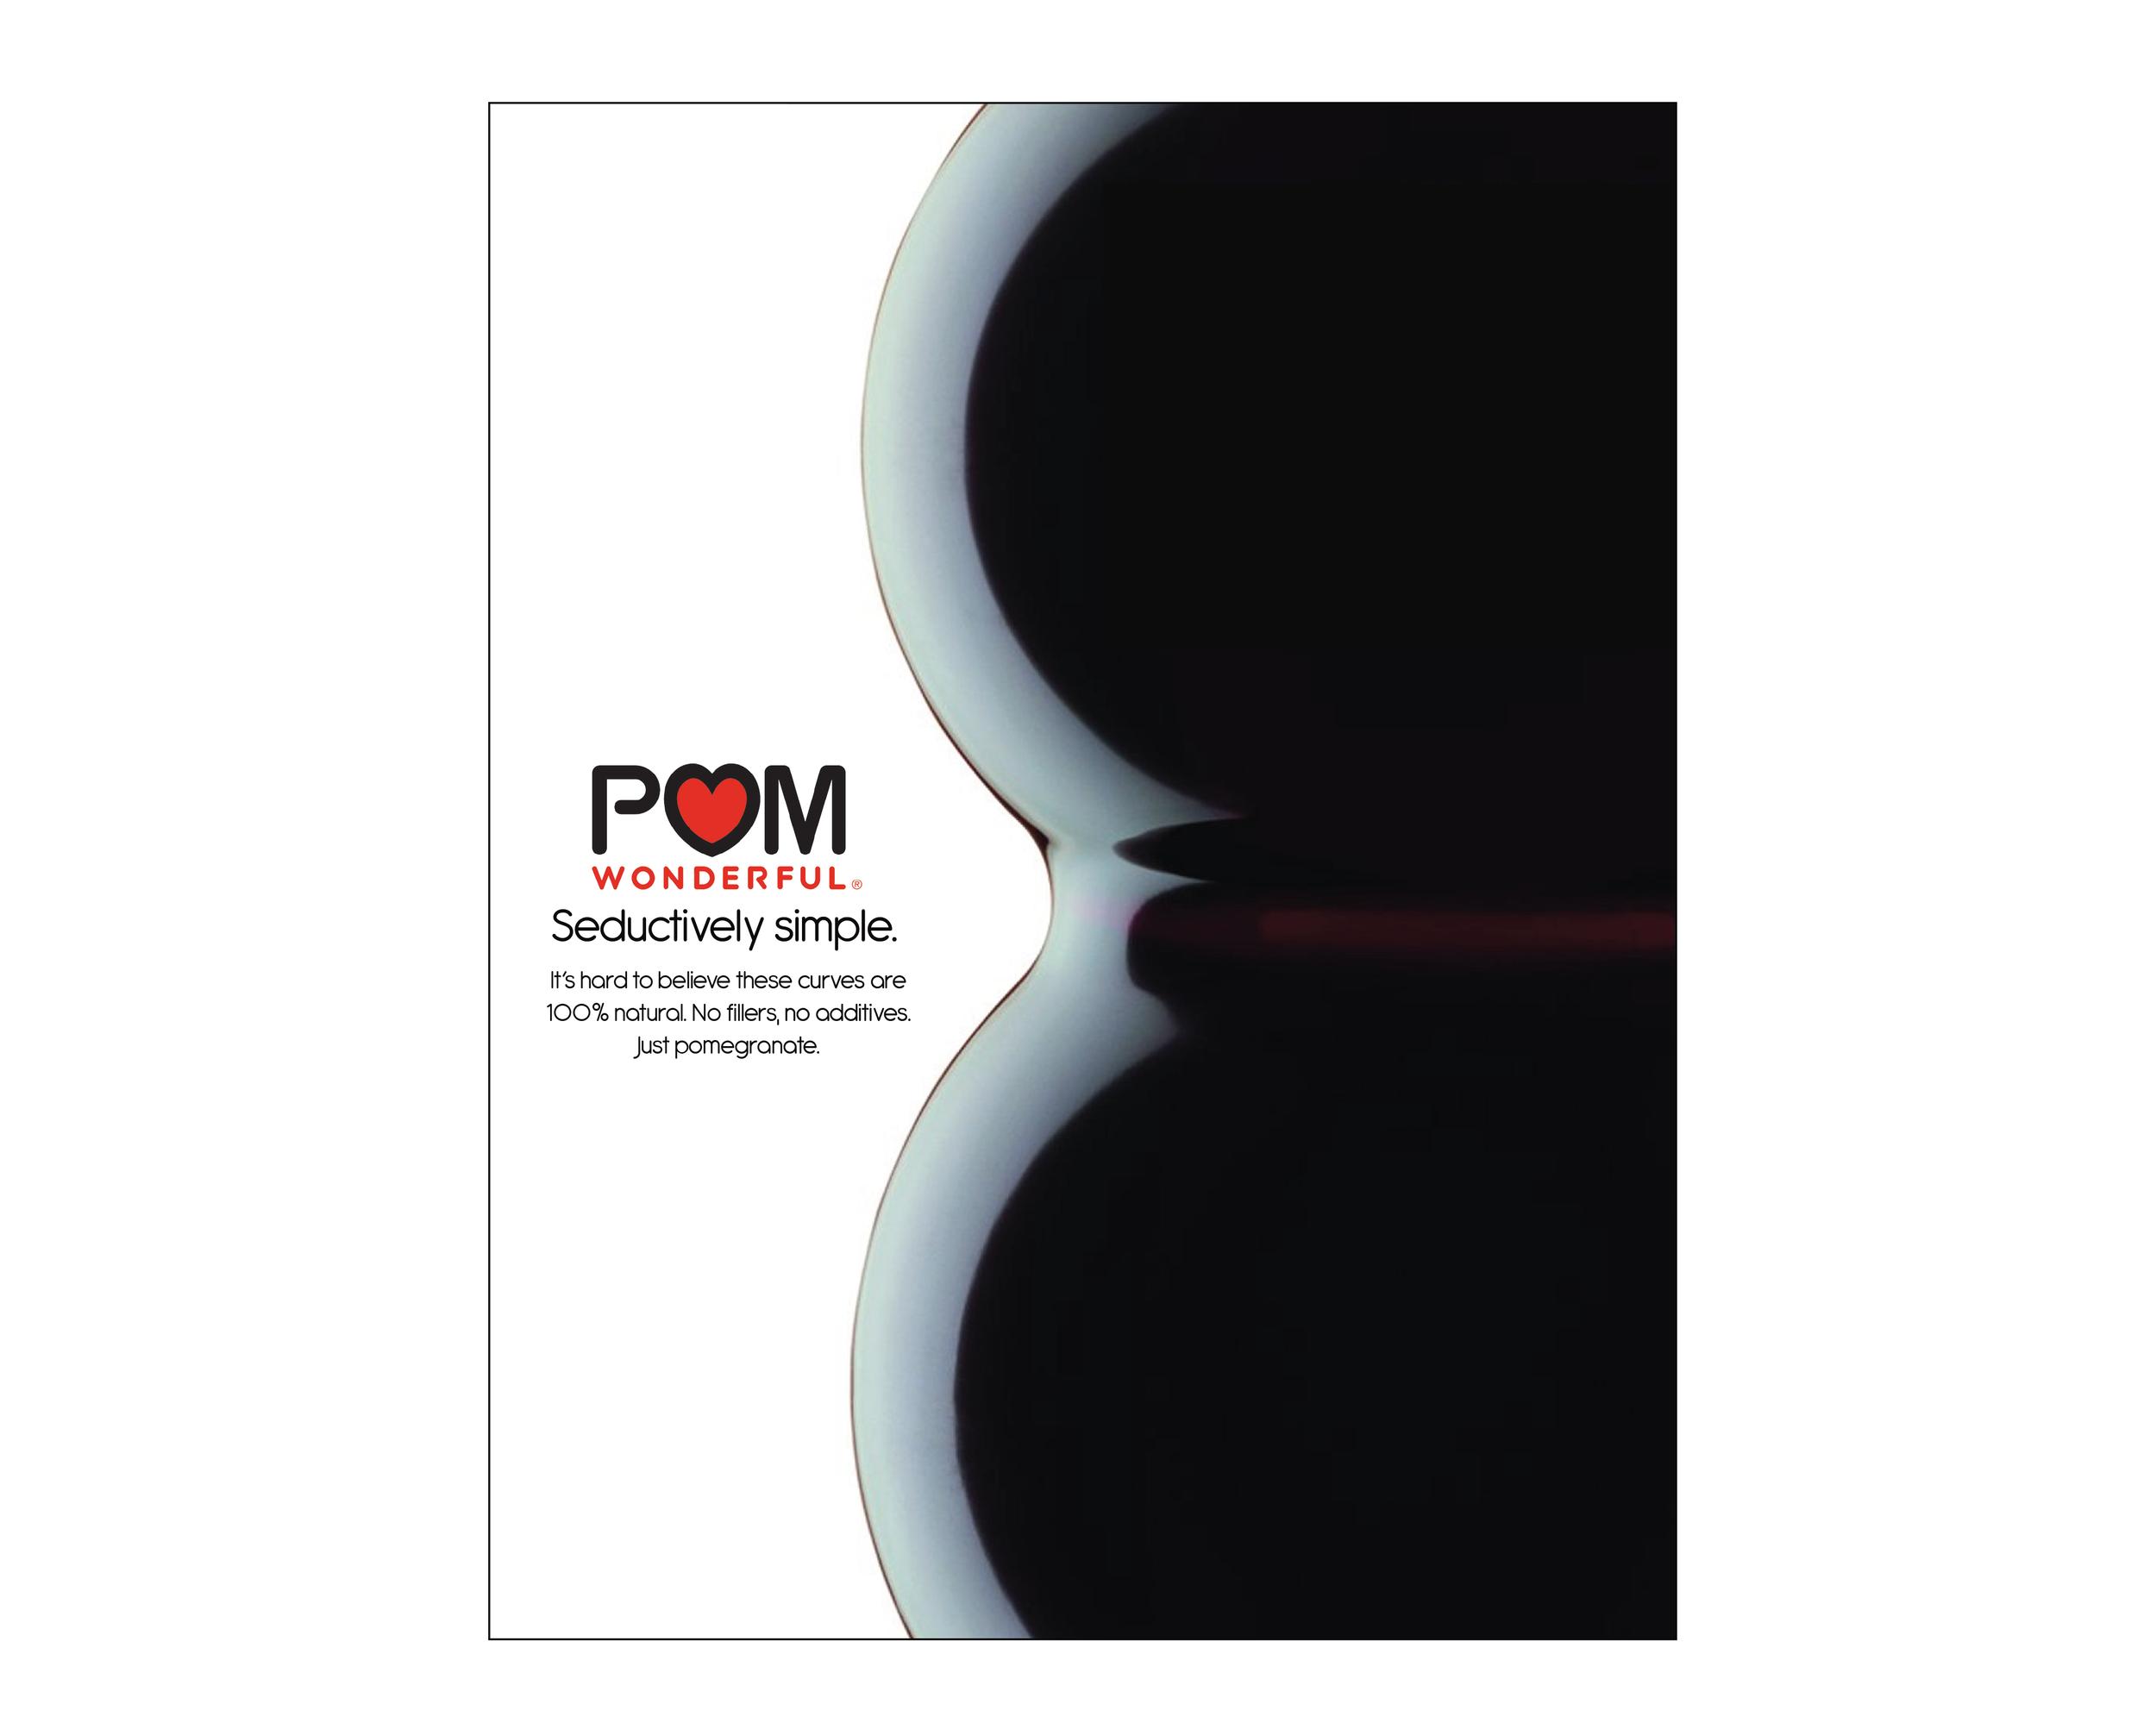 pom_ads_-02.png